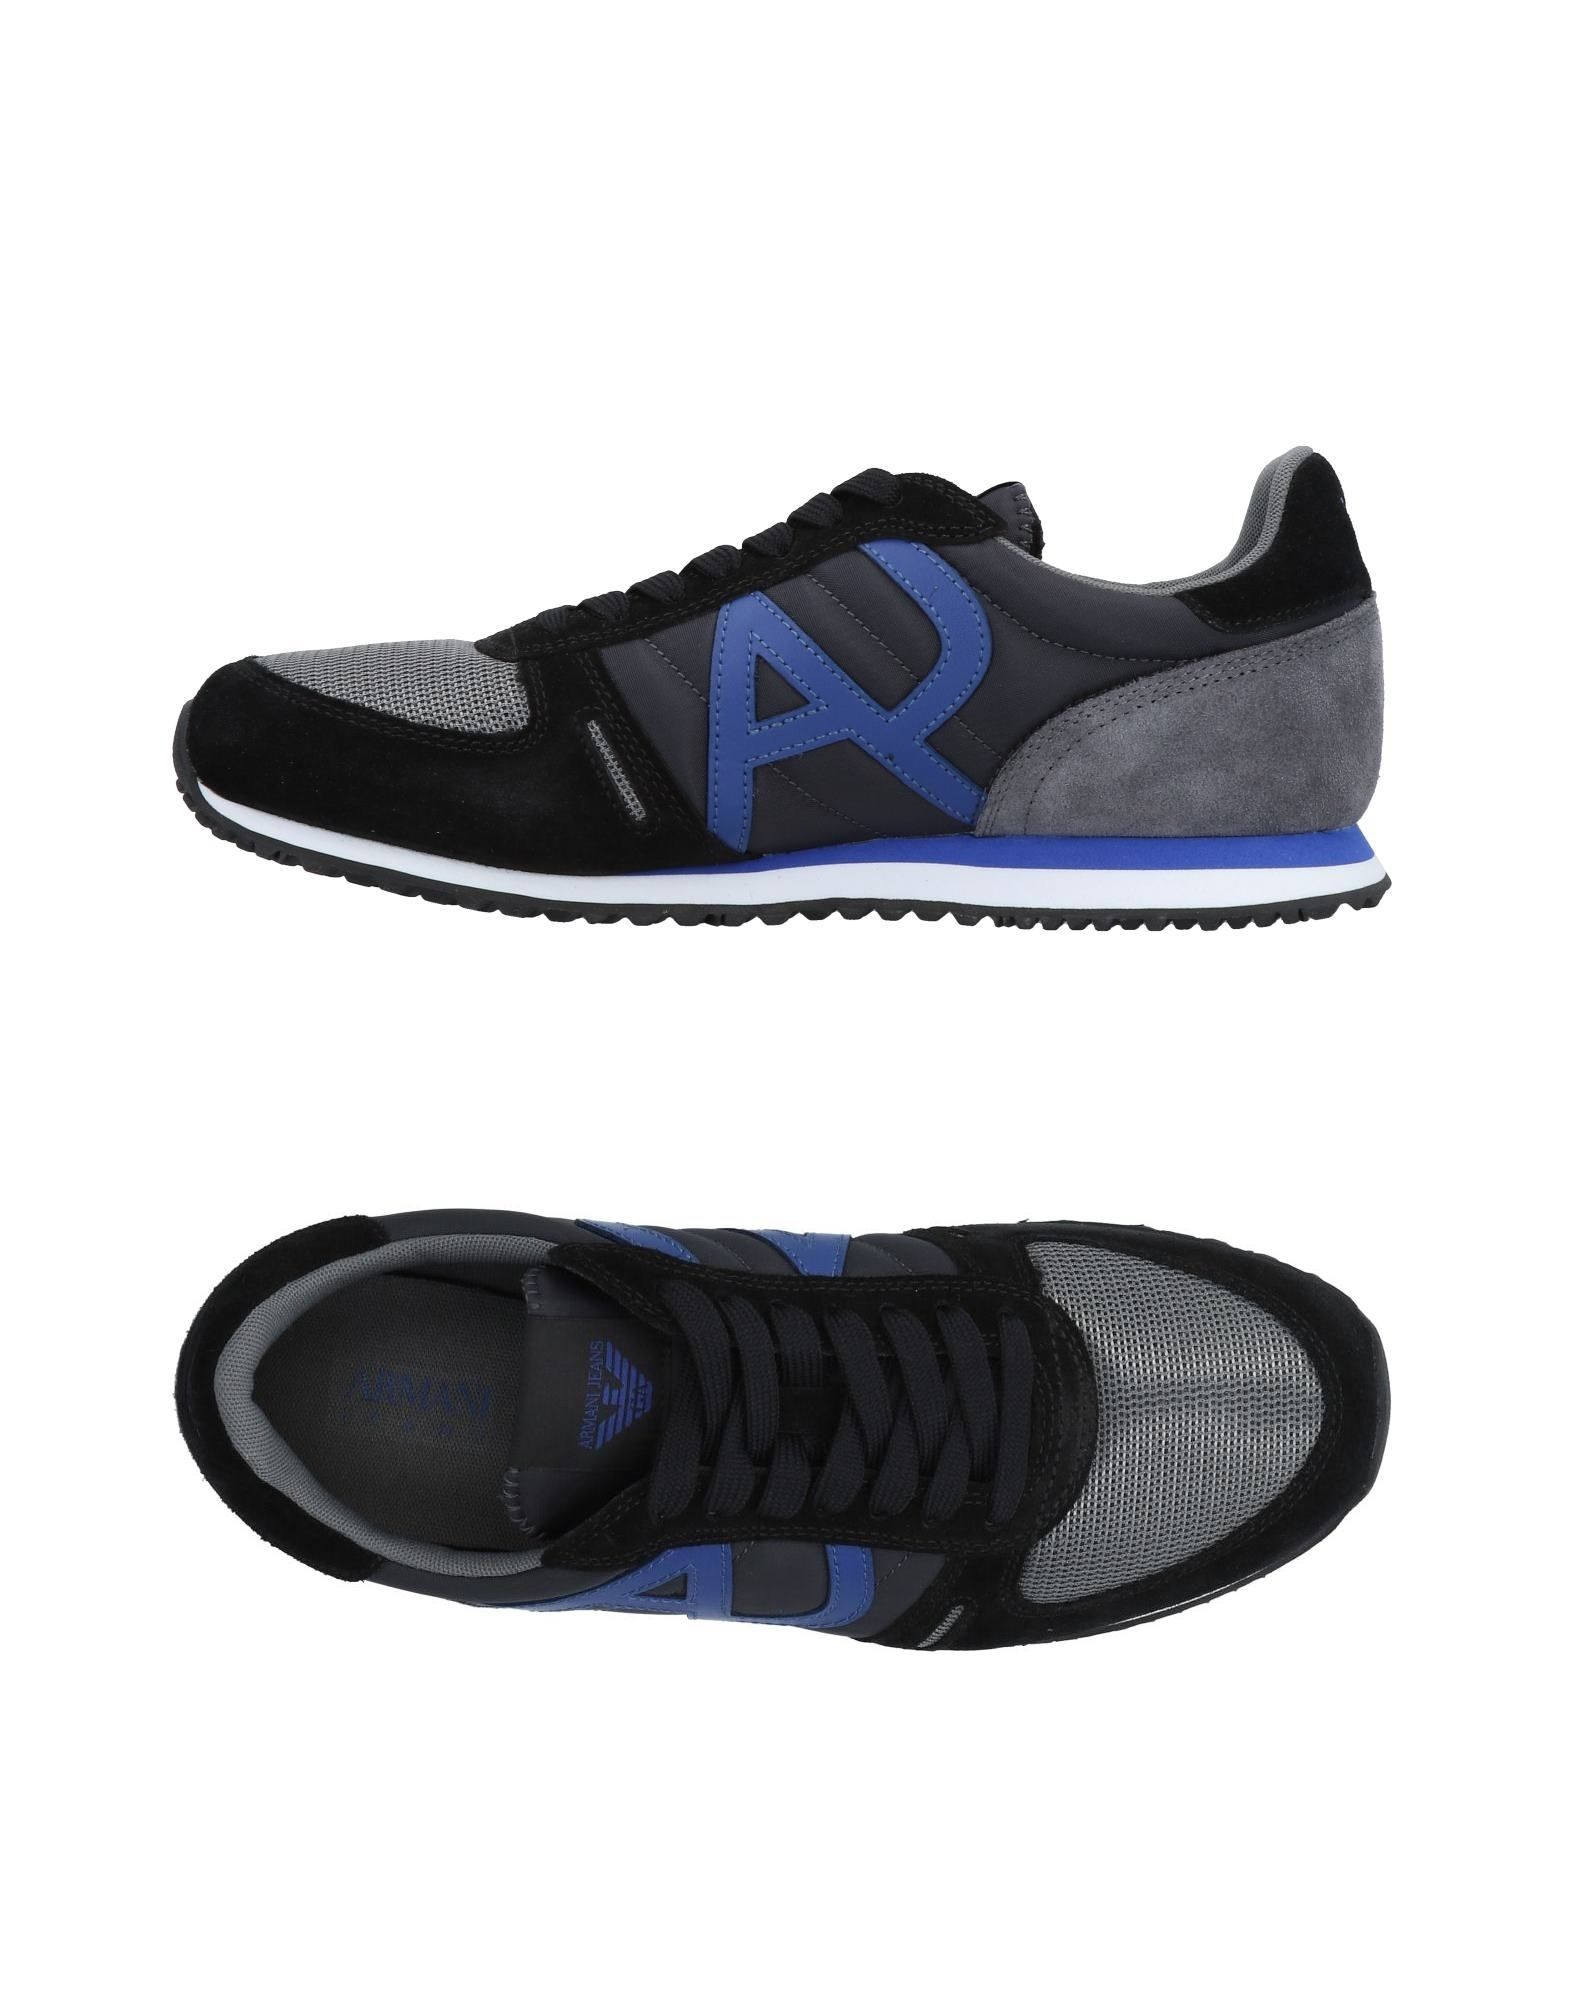 Sneakers Armani Jeans Uomo - 11492206BQ 11492206BQ - ace123